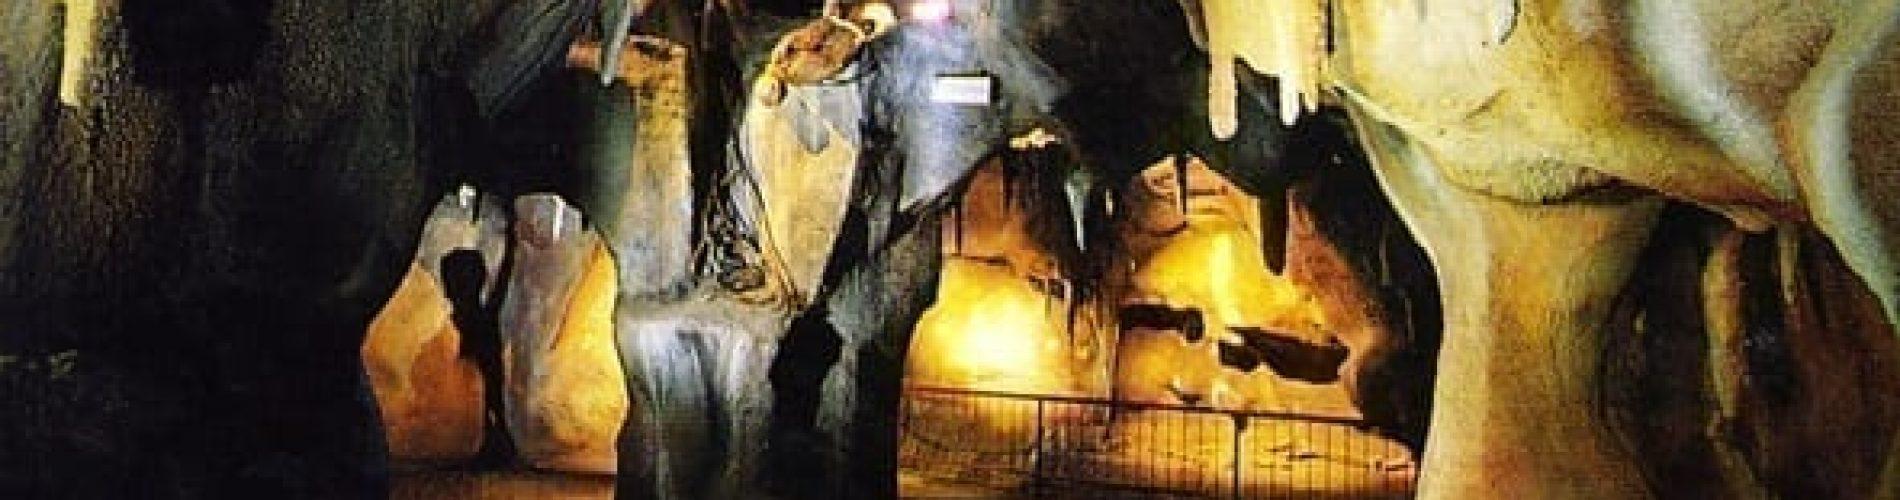 limestone-caves